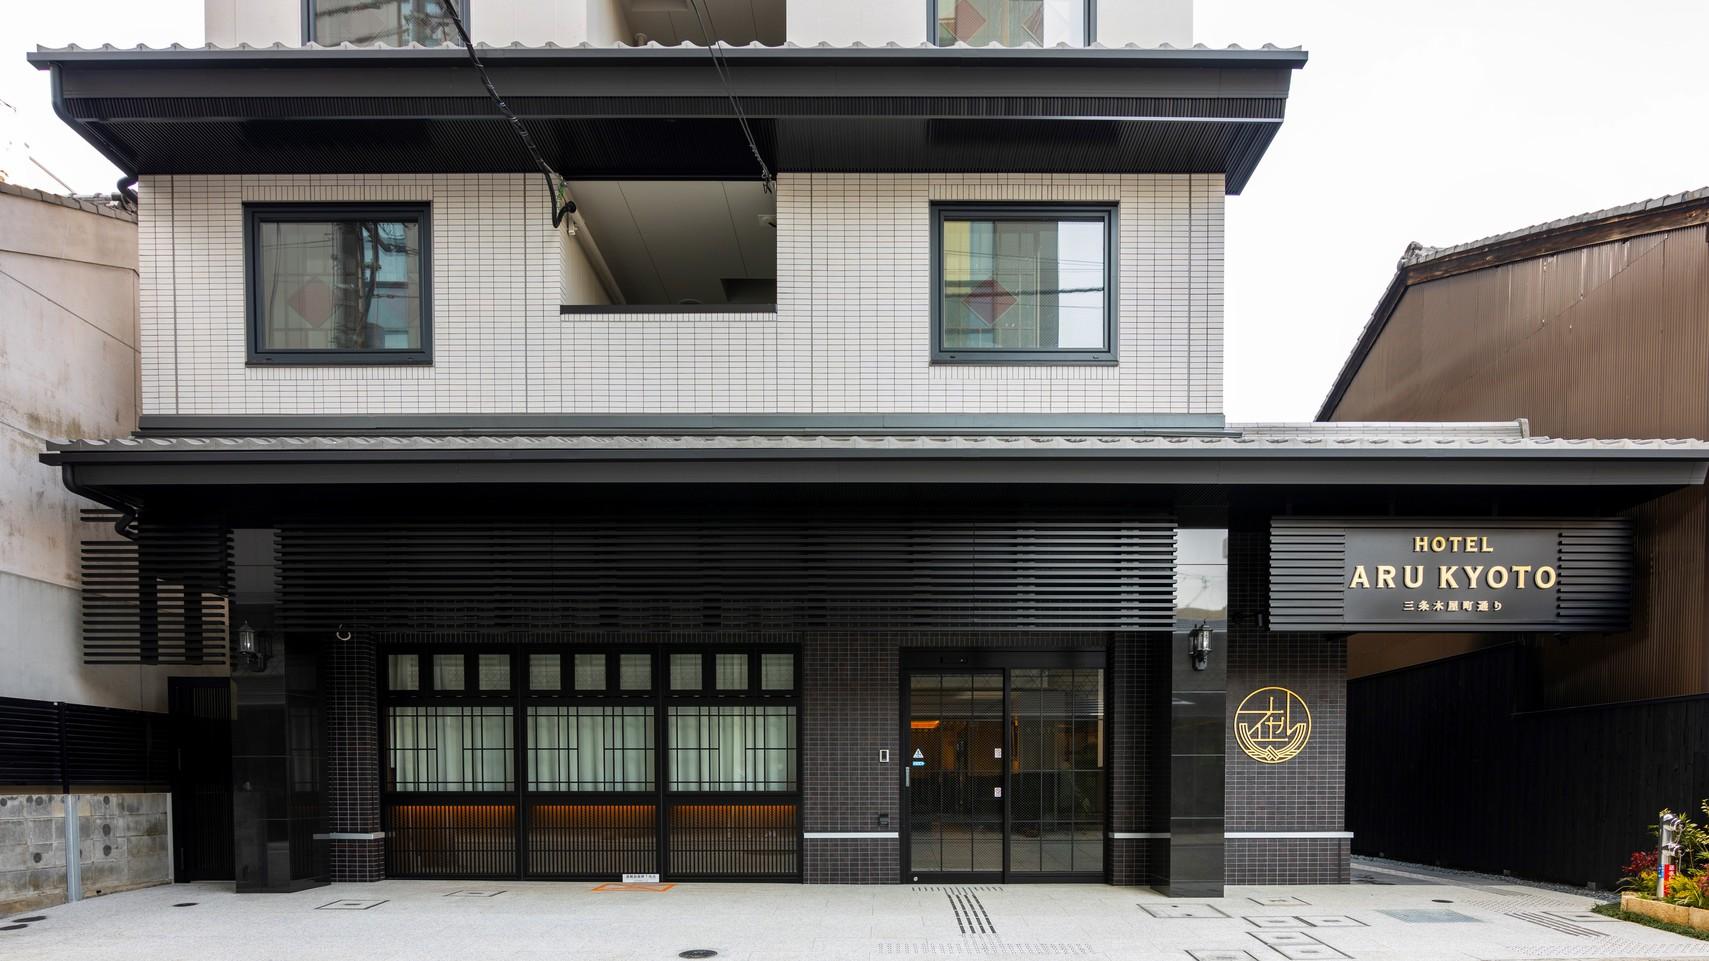 HOTEL ARU KYOTO 三条木屋町通り(ホテルアル京都)2021年7月15日グランドオープン